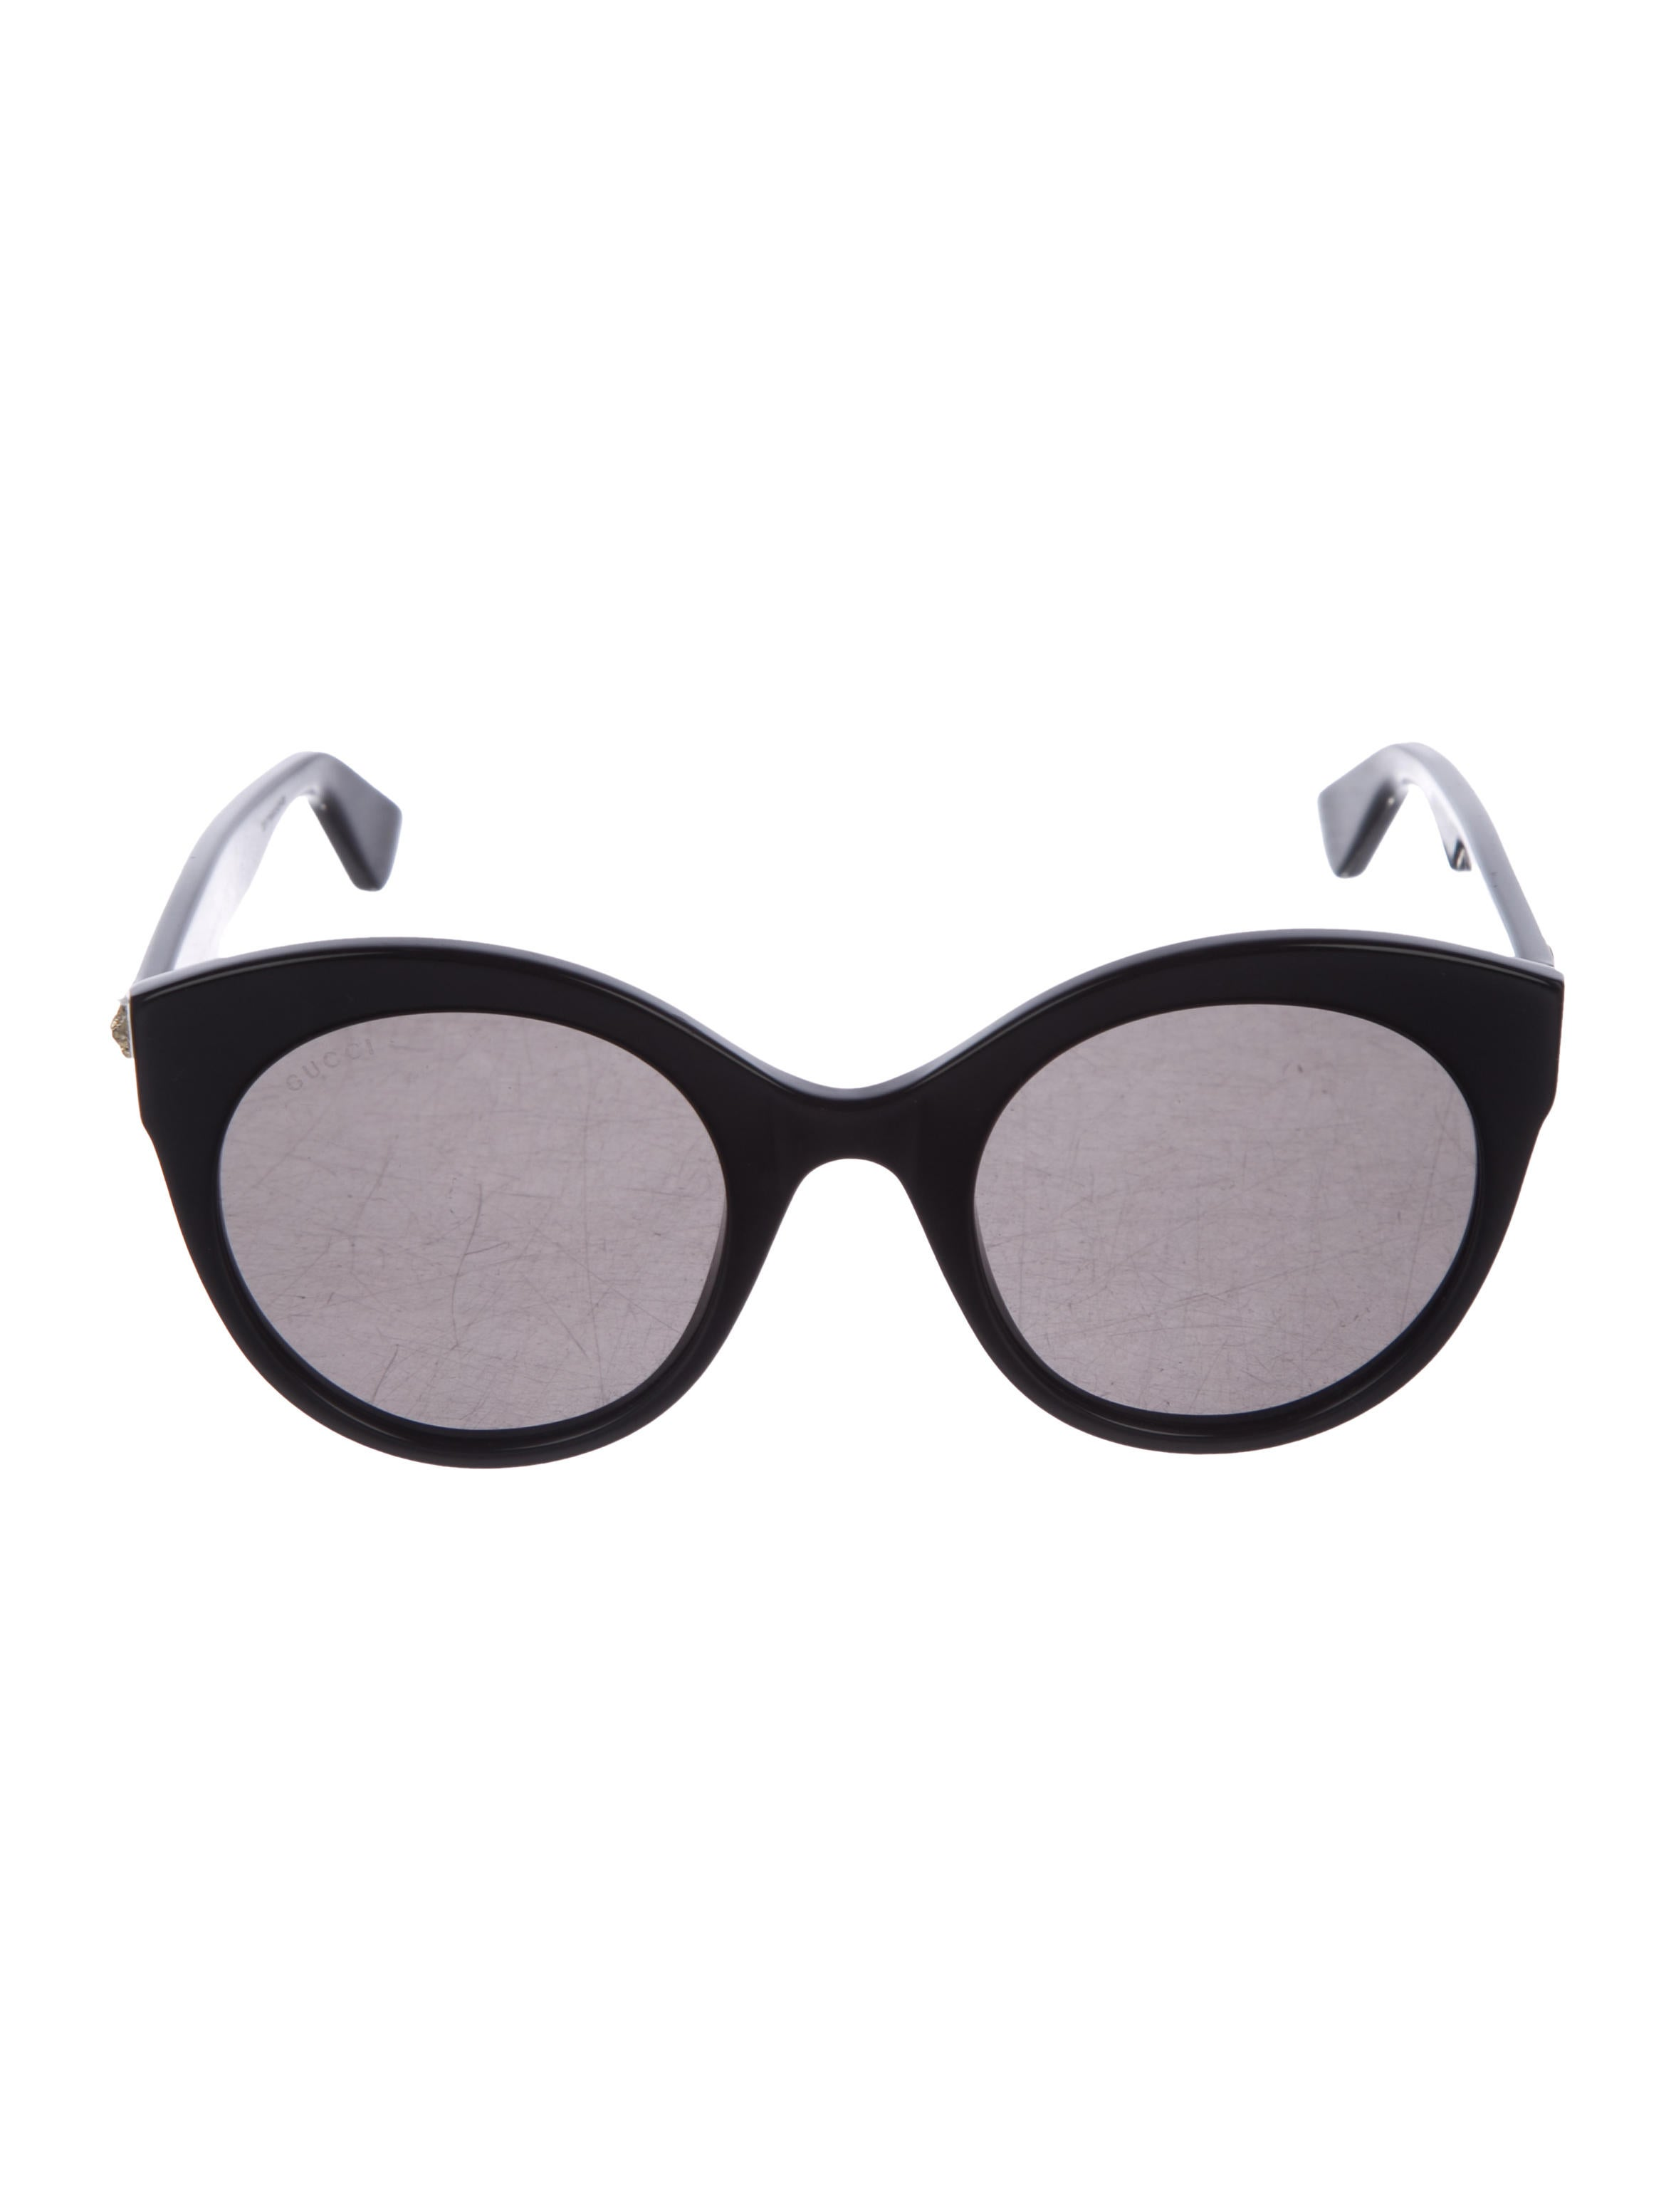 44f53fe452c Gucci Round Cat-Eye Sunglasses - Accessories - GUC247428